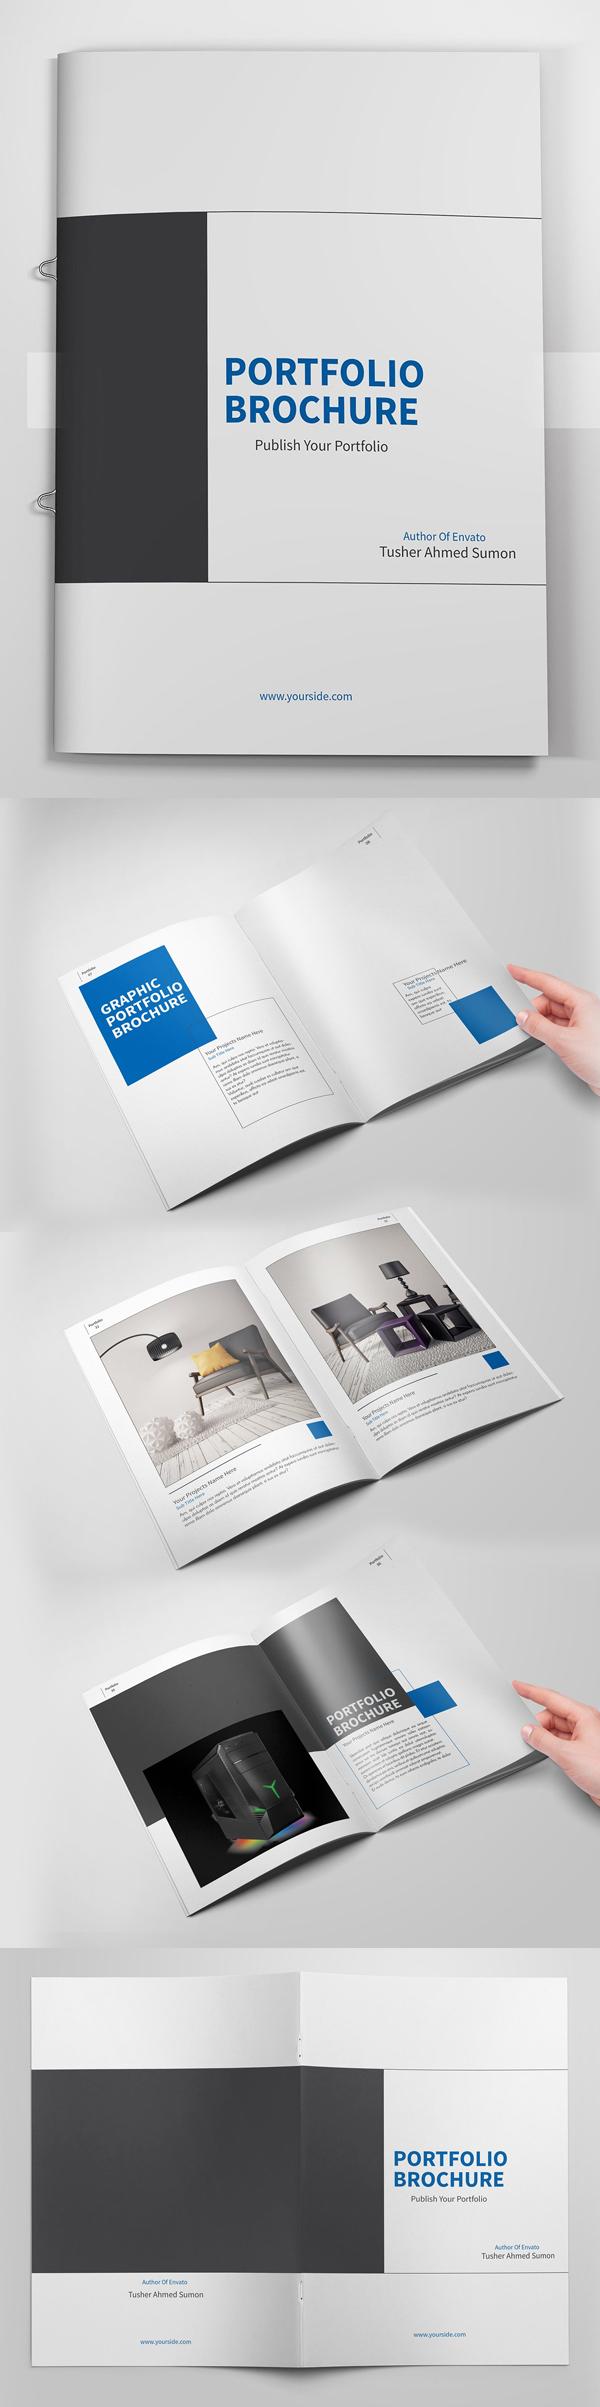 Portfolio Brochures Template